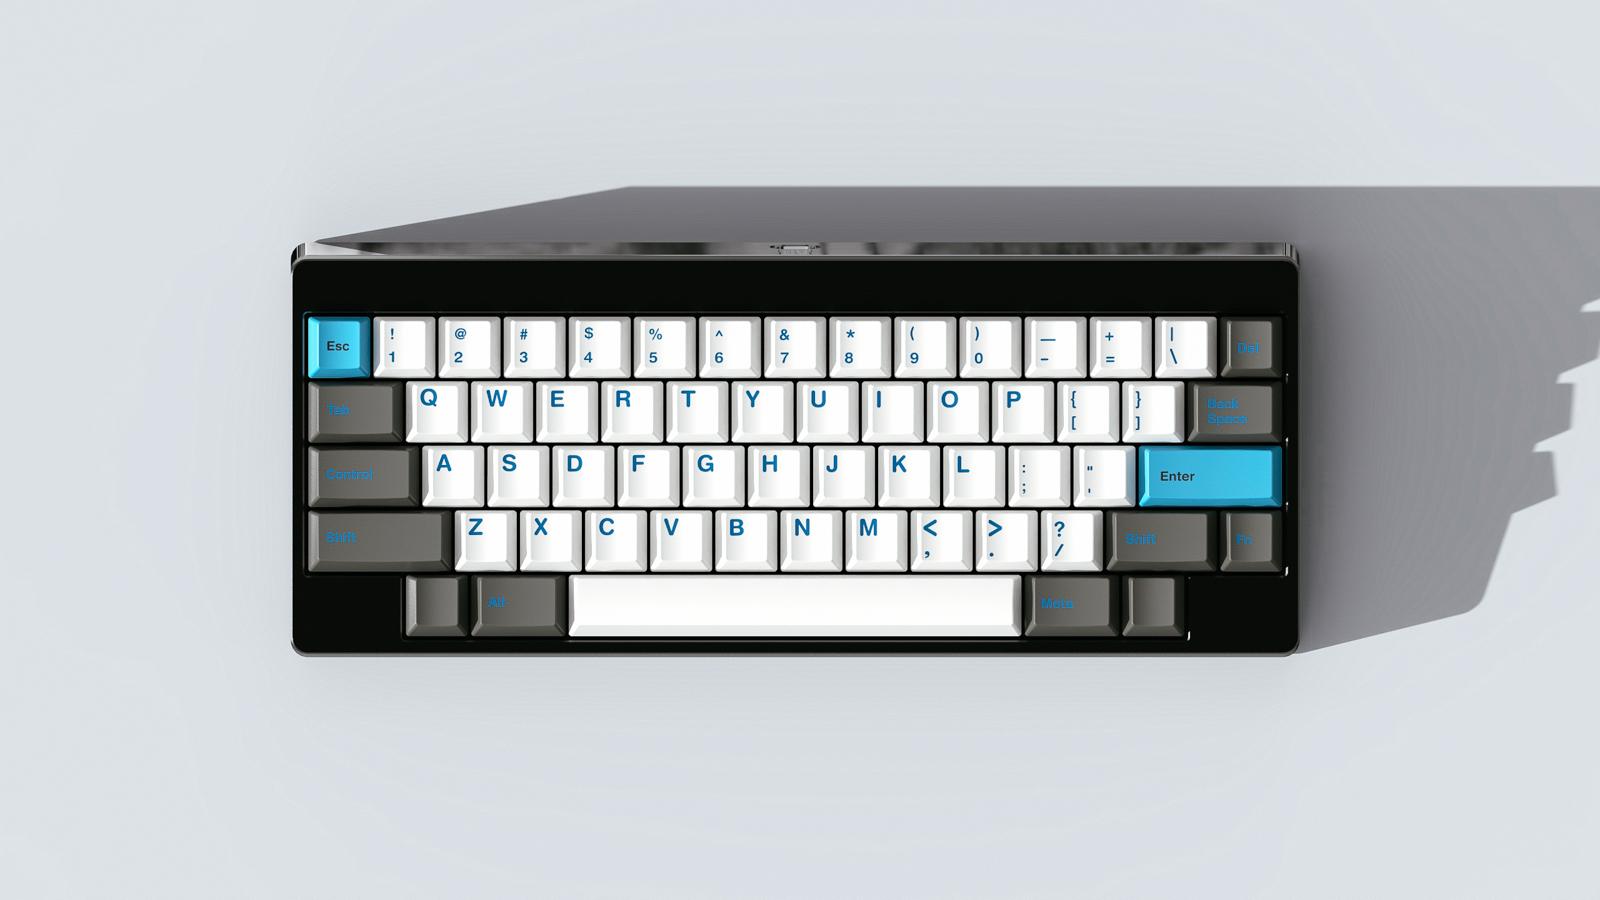 RAMA-M60-A-03.717.jpg